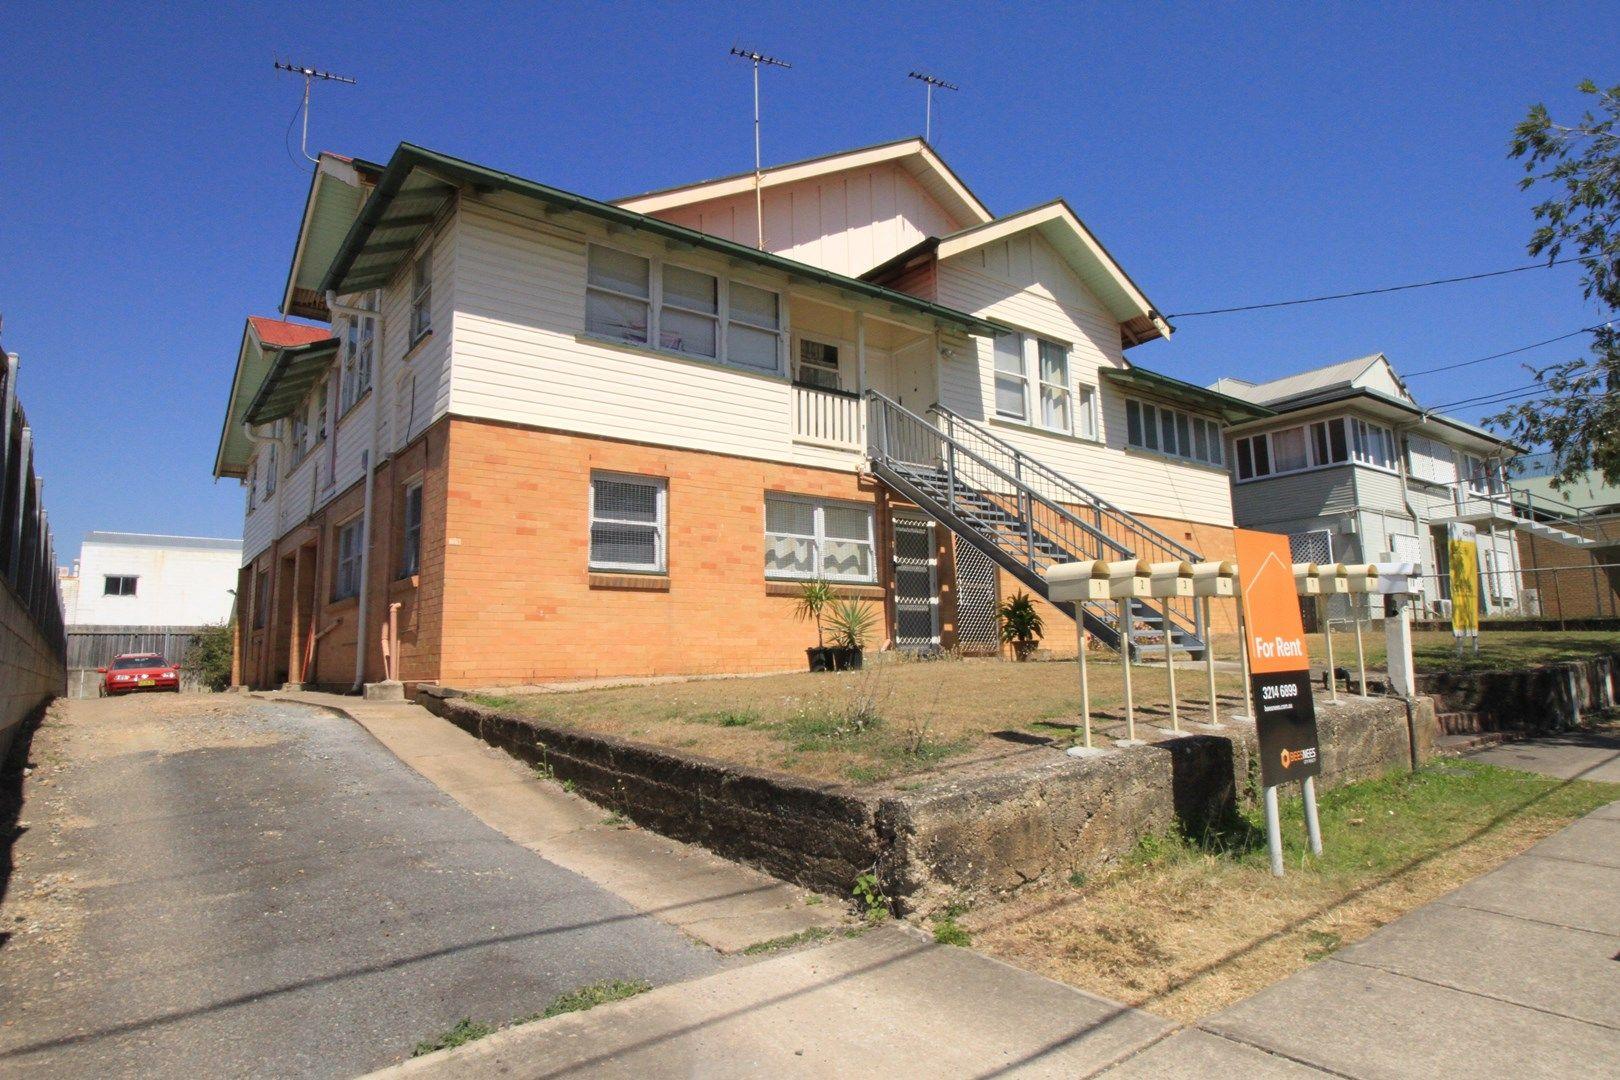 Unit 3/2 Hawthorne St, Woolloongabba QLD 4102, Image 0